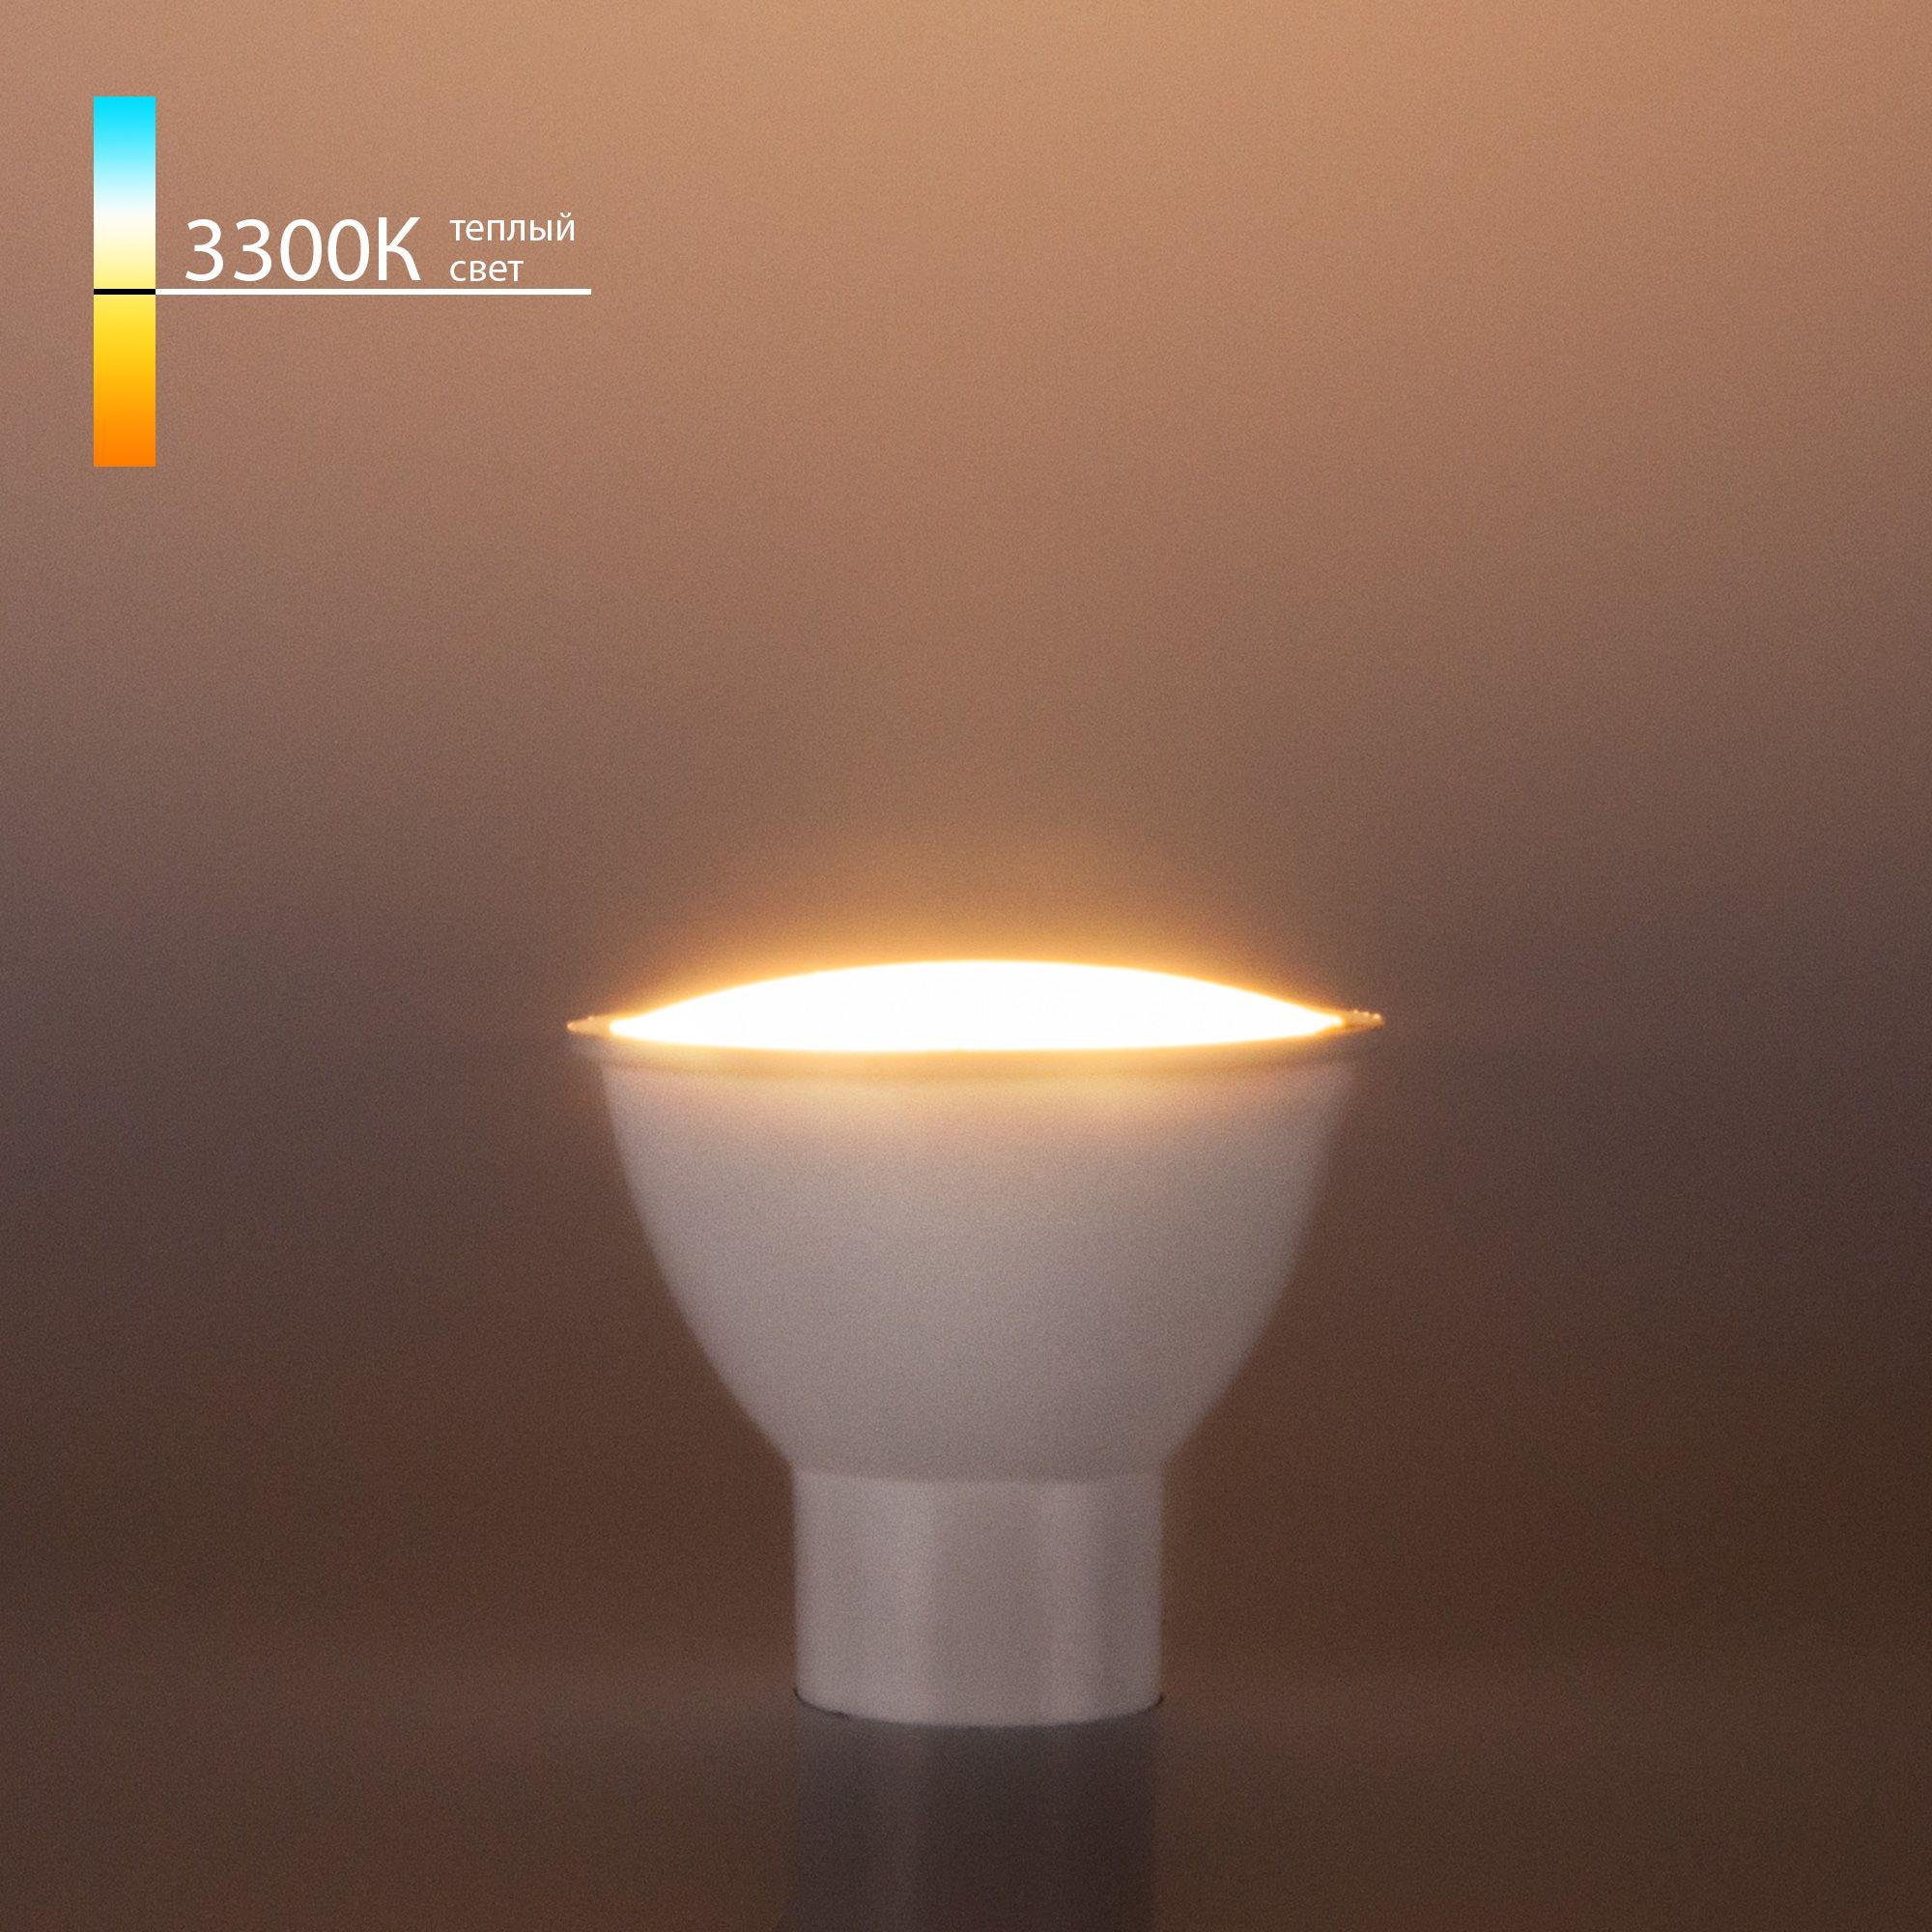 Светодиодная лампа GU10 LED 5W 3300K